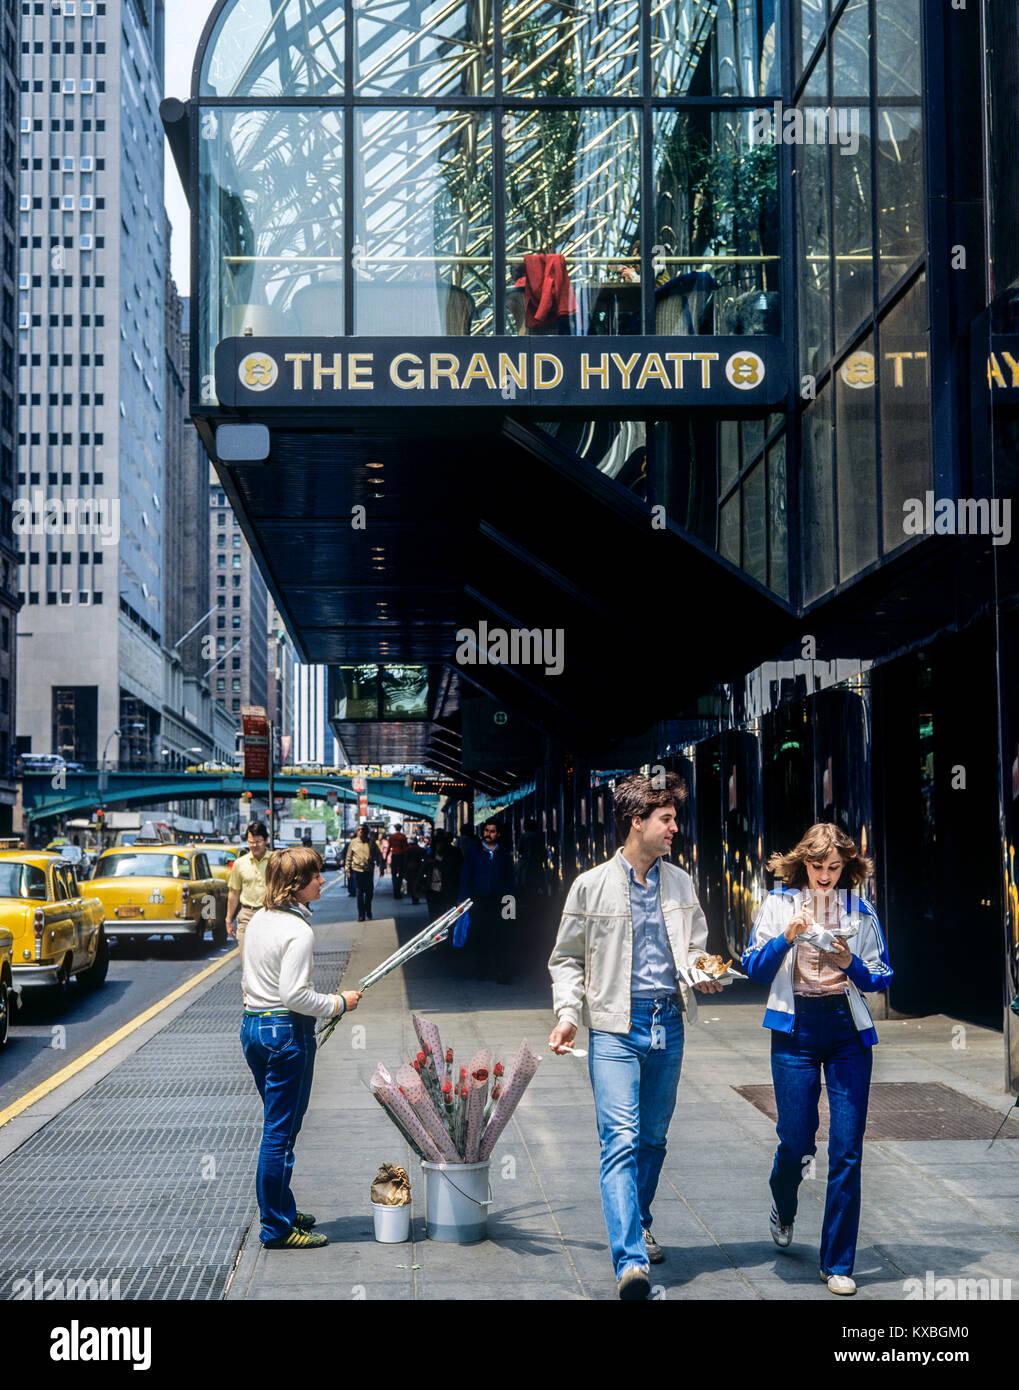 May 1982,New York,flowers vendor,The Grand Hyatt hotel,East 42nd street,Manhattan,New york City,NY,NYC,USA, - Stock Image